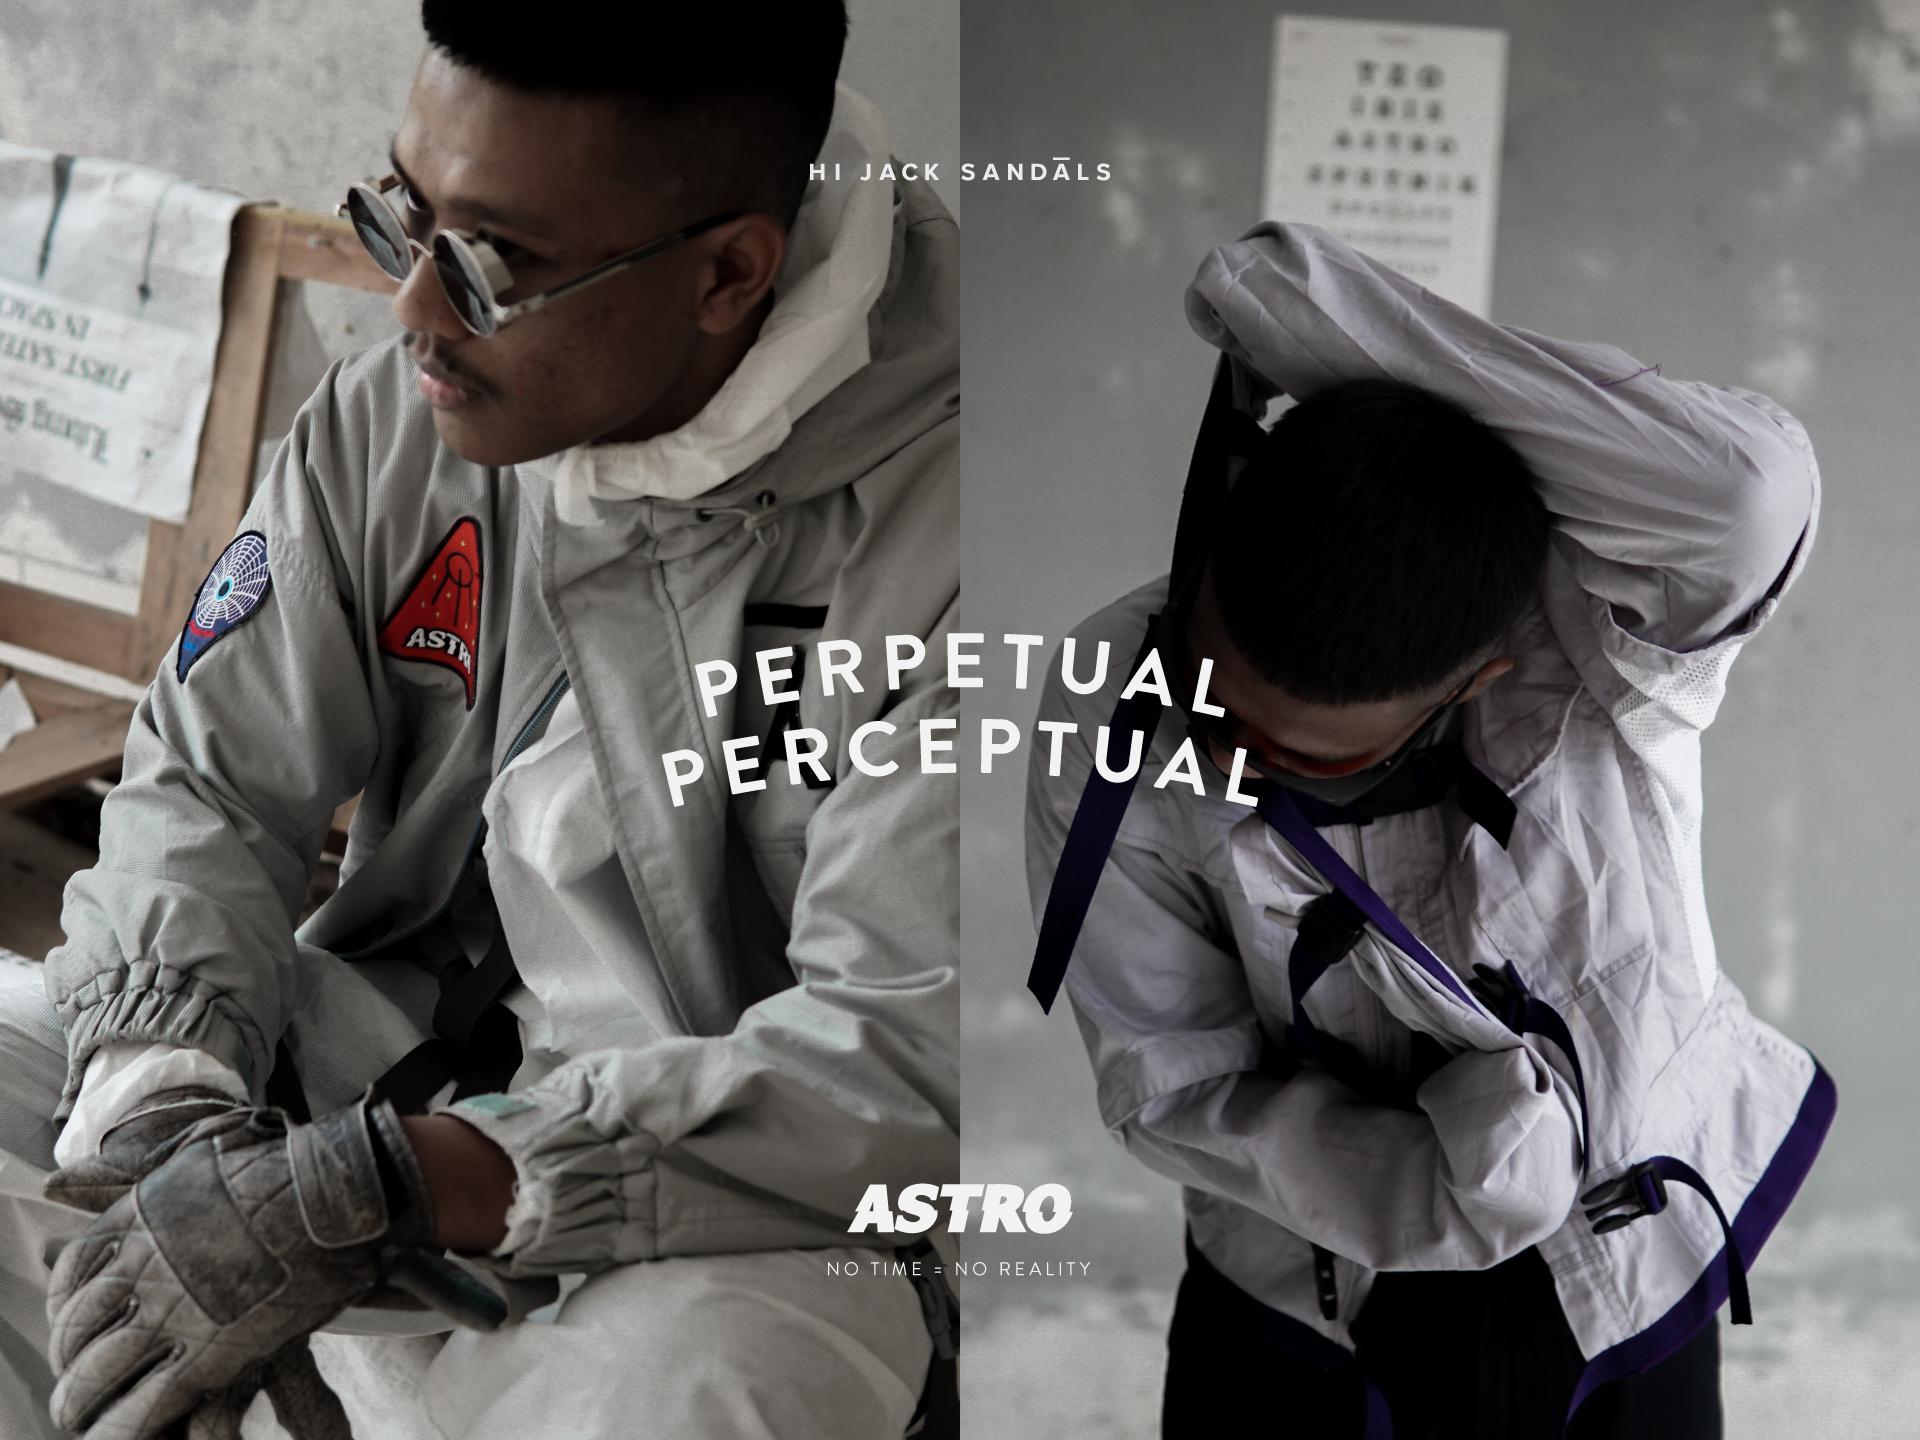 ASTRO – PERPETUAL PERCEPTUAL